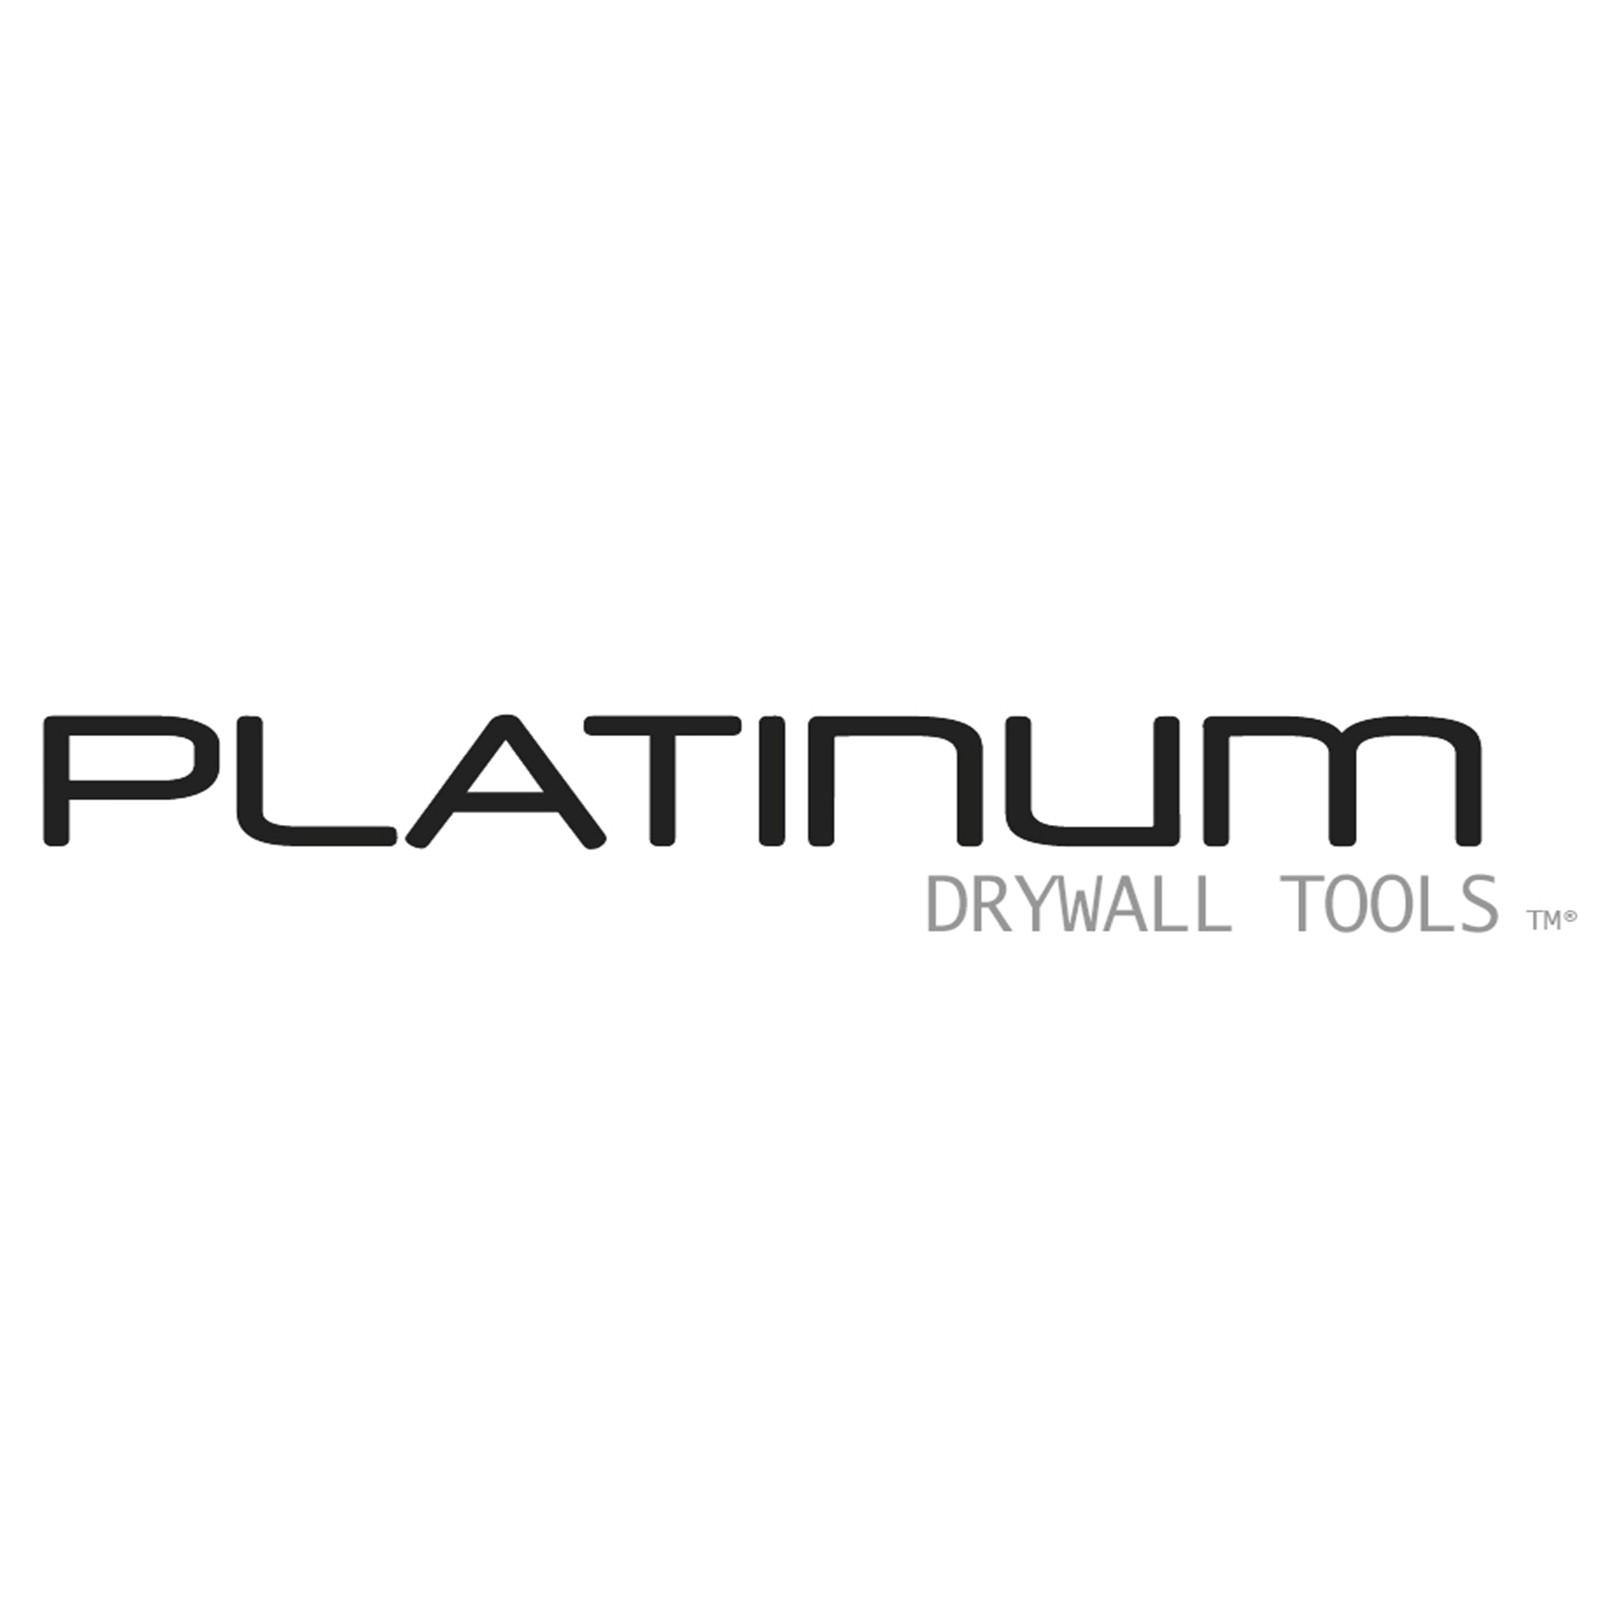 Platinum Drywall Tools